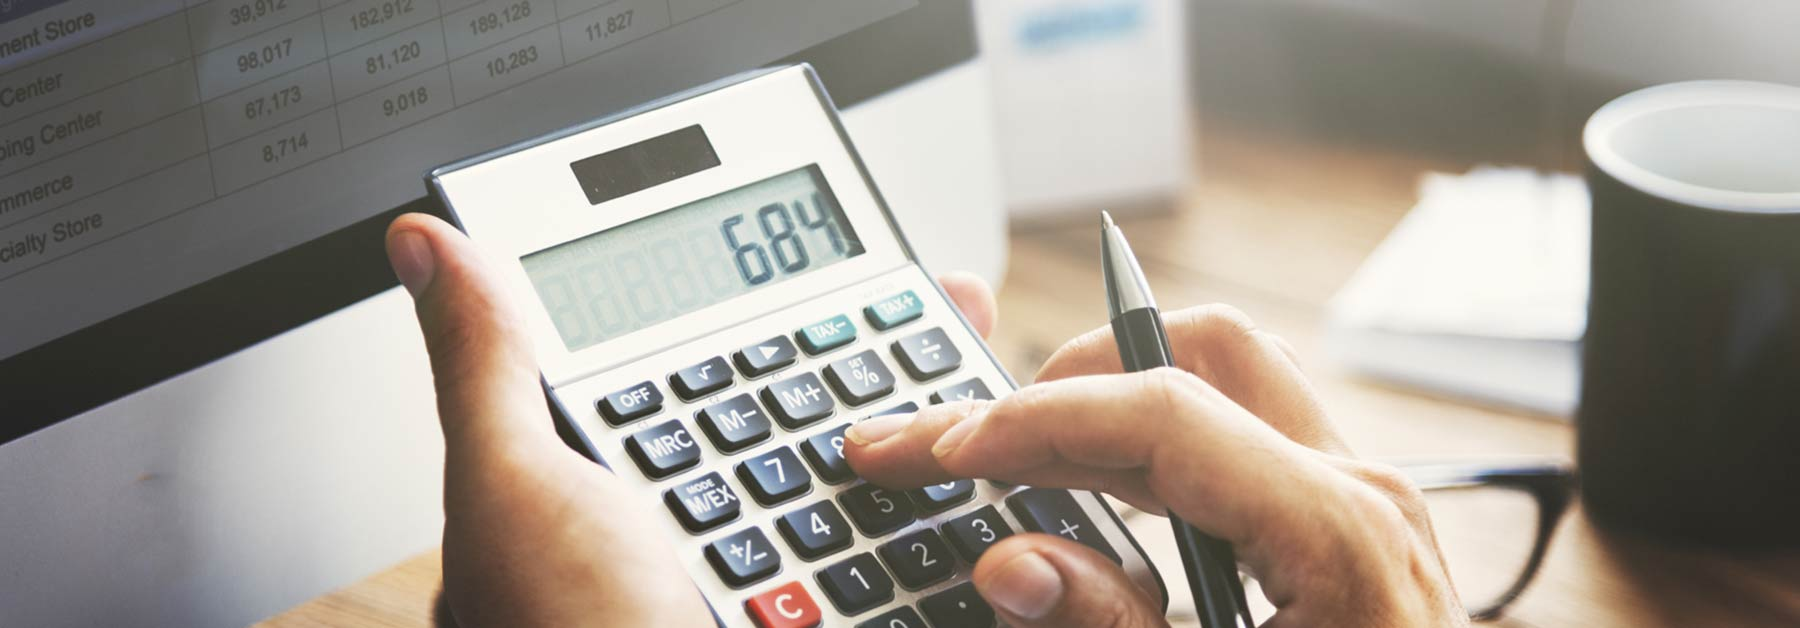 hand-calculator